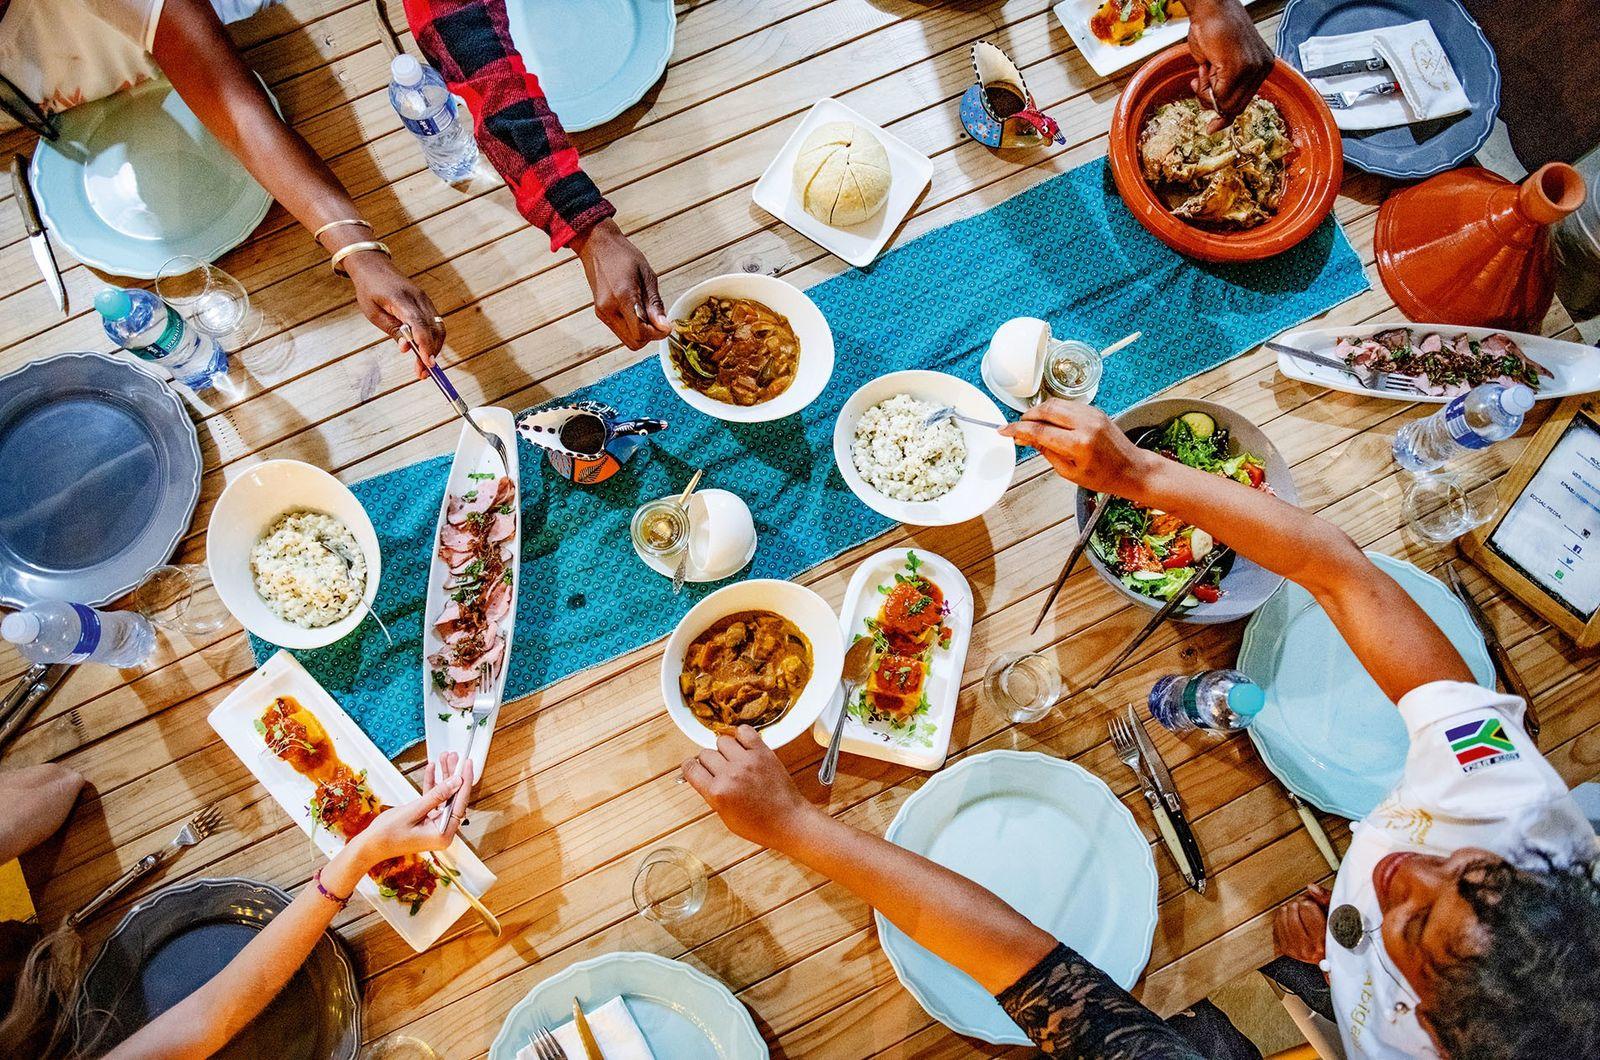 Communal feast